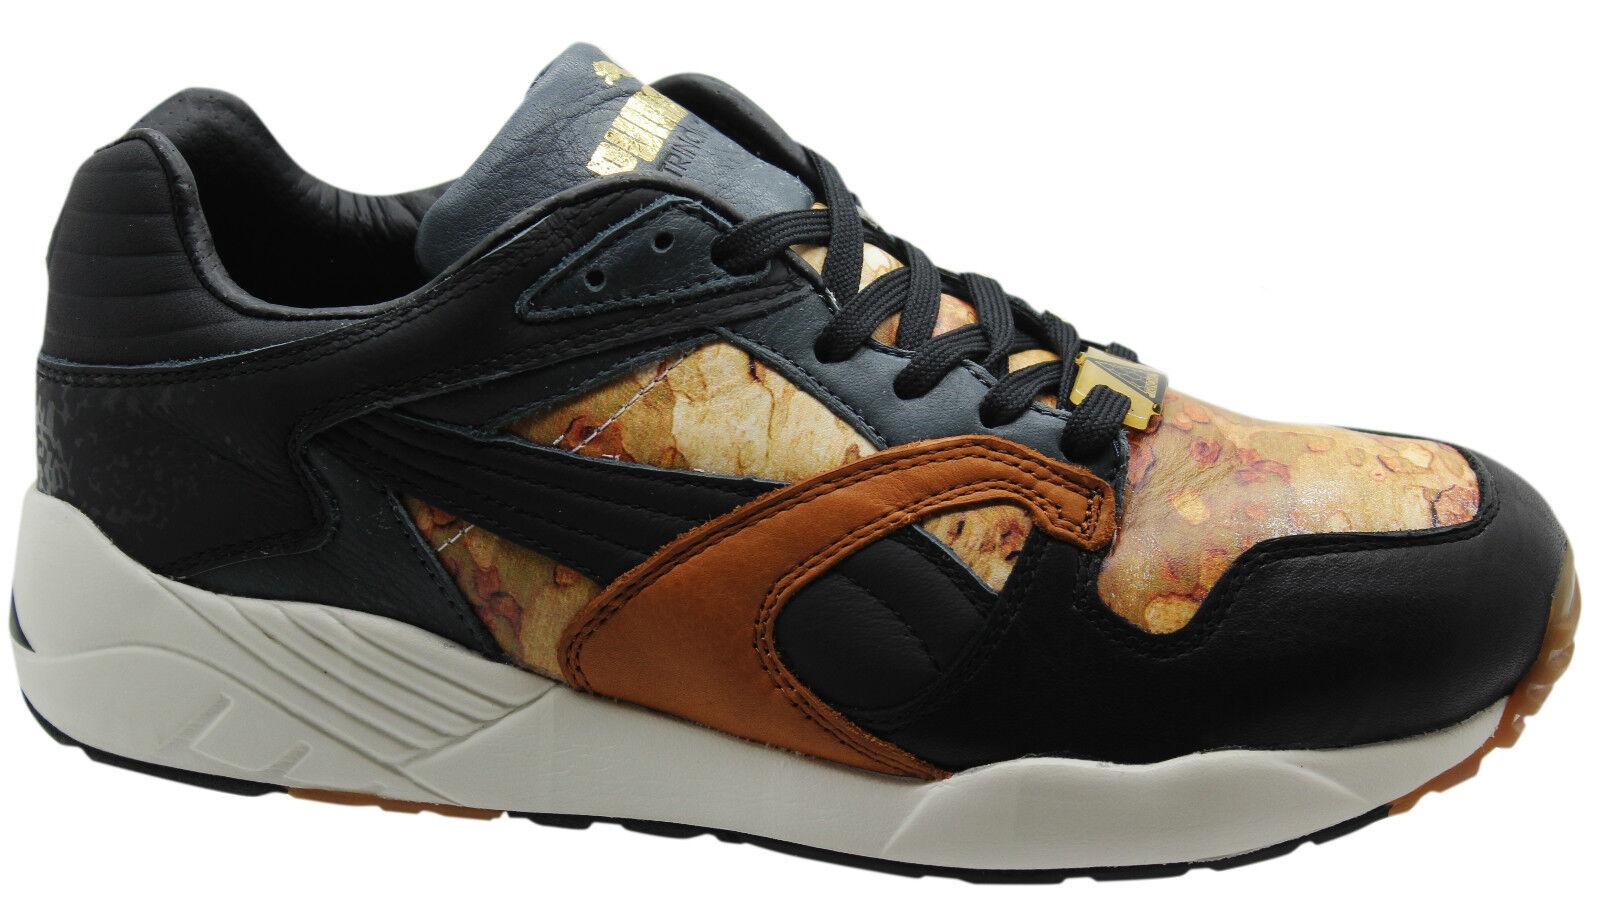 Puma trinomic xs 850 plus camo scarpe pelle sportliche  Herren nero pelle scarpe aber 357362 01 495d4d